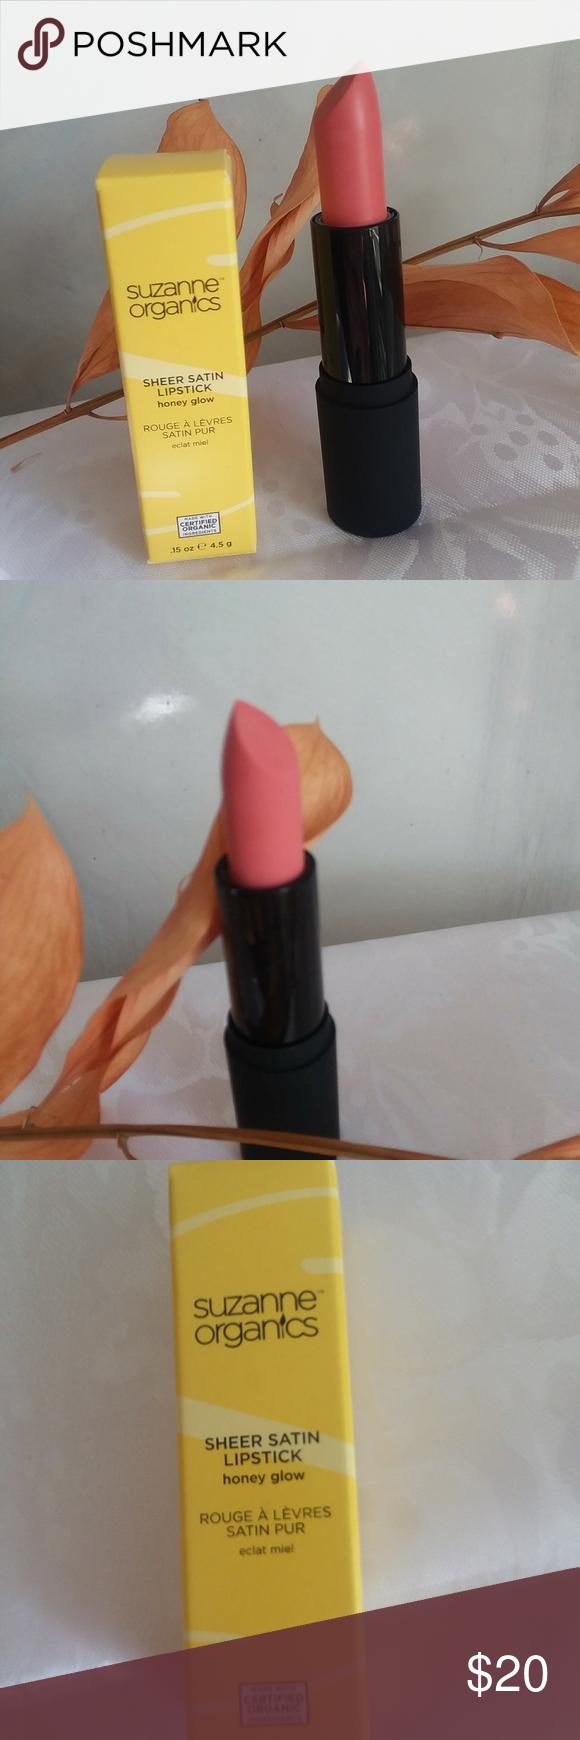 Suzanne Organics Lipstick Honey Glow Suzanne Somers New